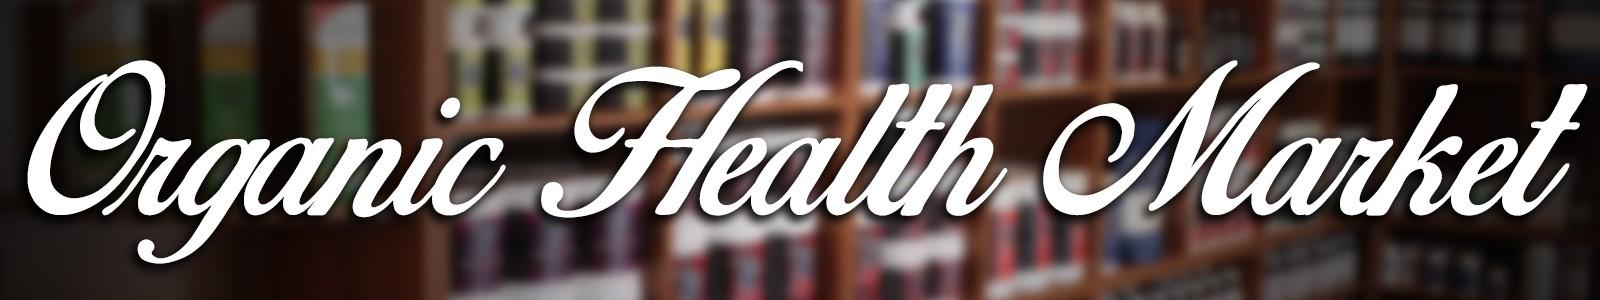 Organic Health Food Market Wellness Origin Carmel, IN